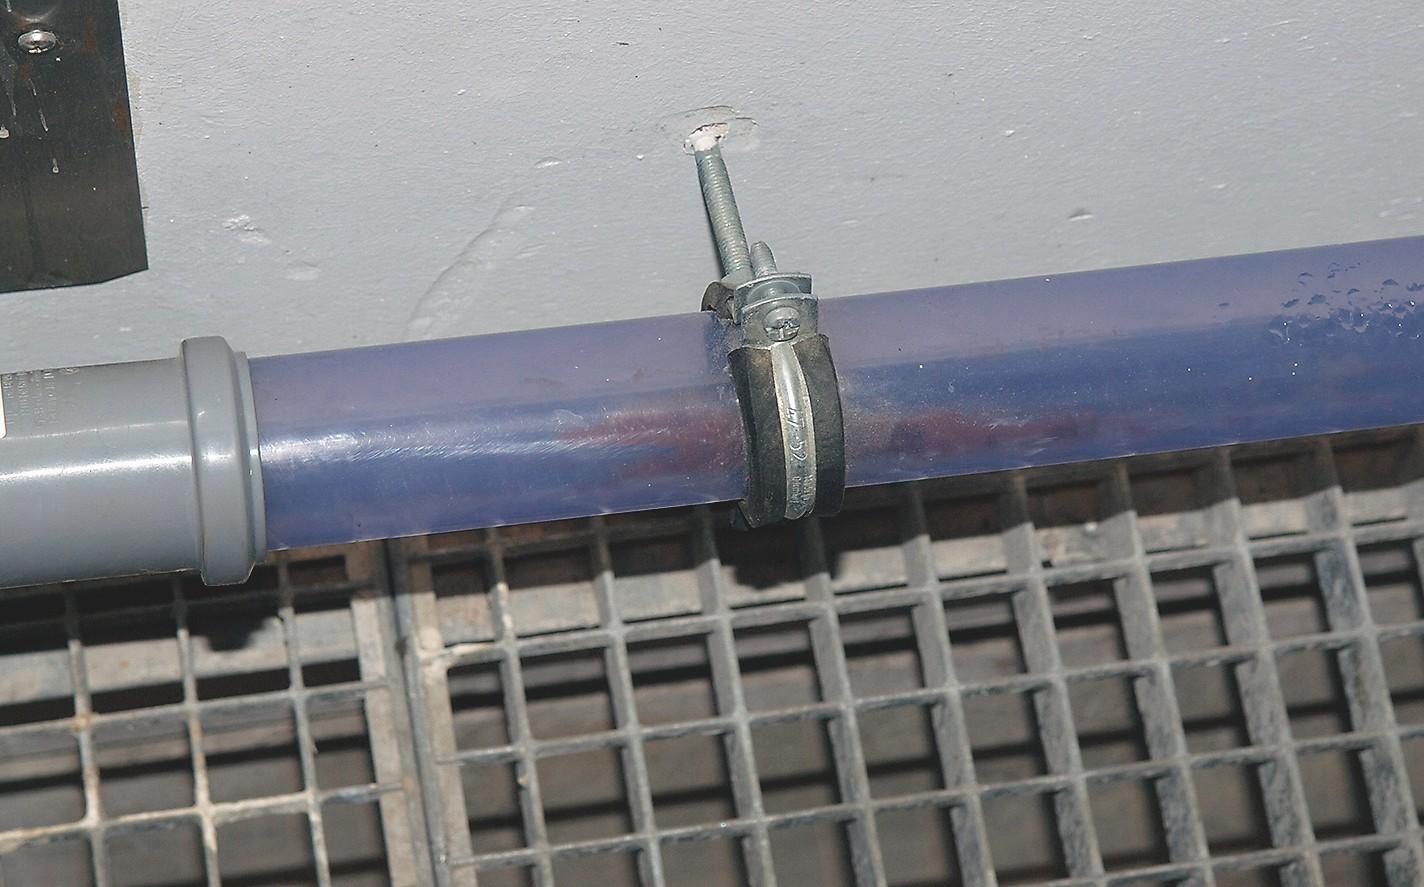 Die schmalen Abflussrohre (80 mm) sind bewusst transparent